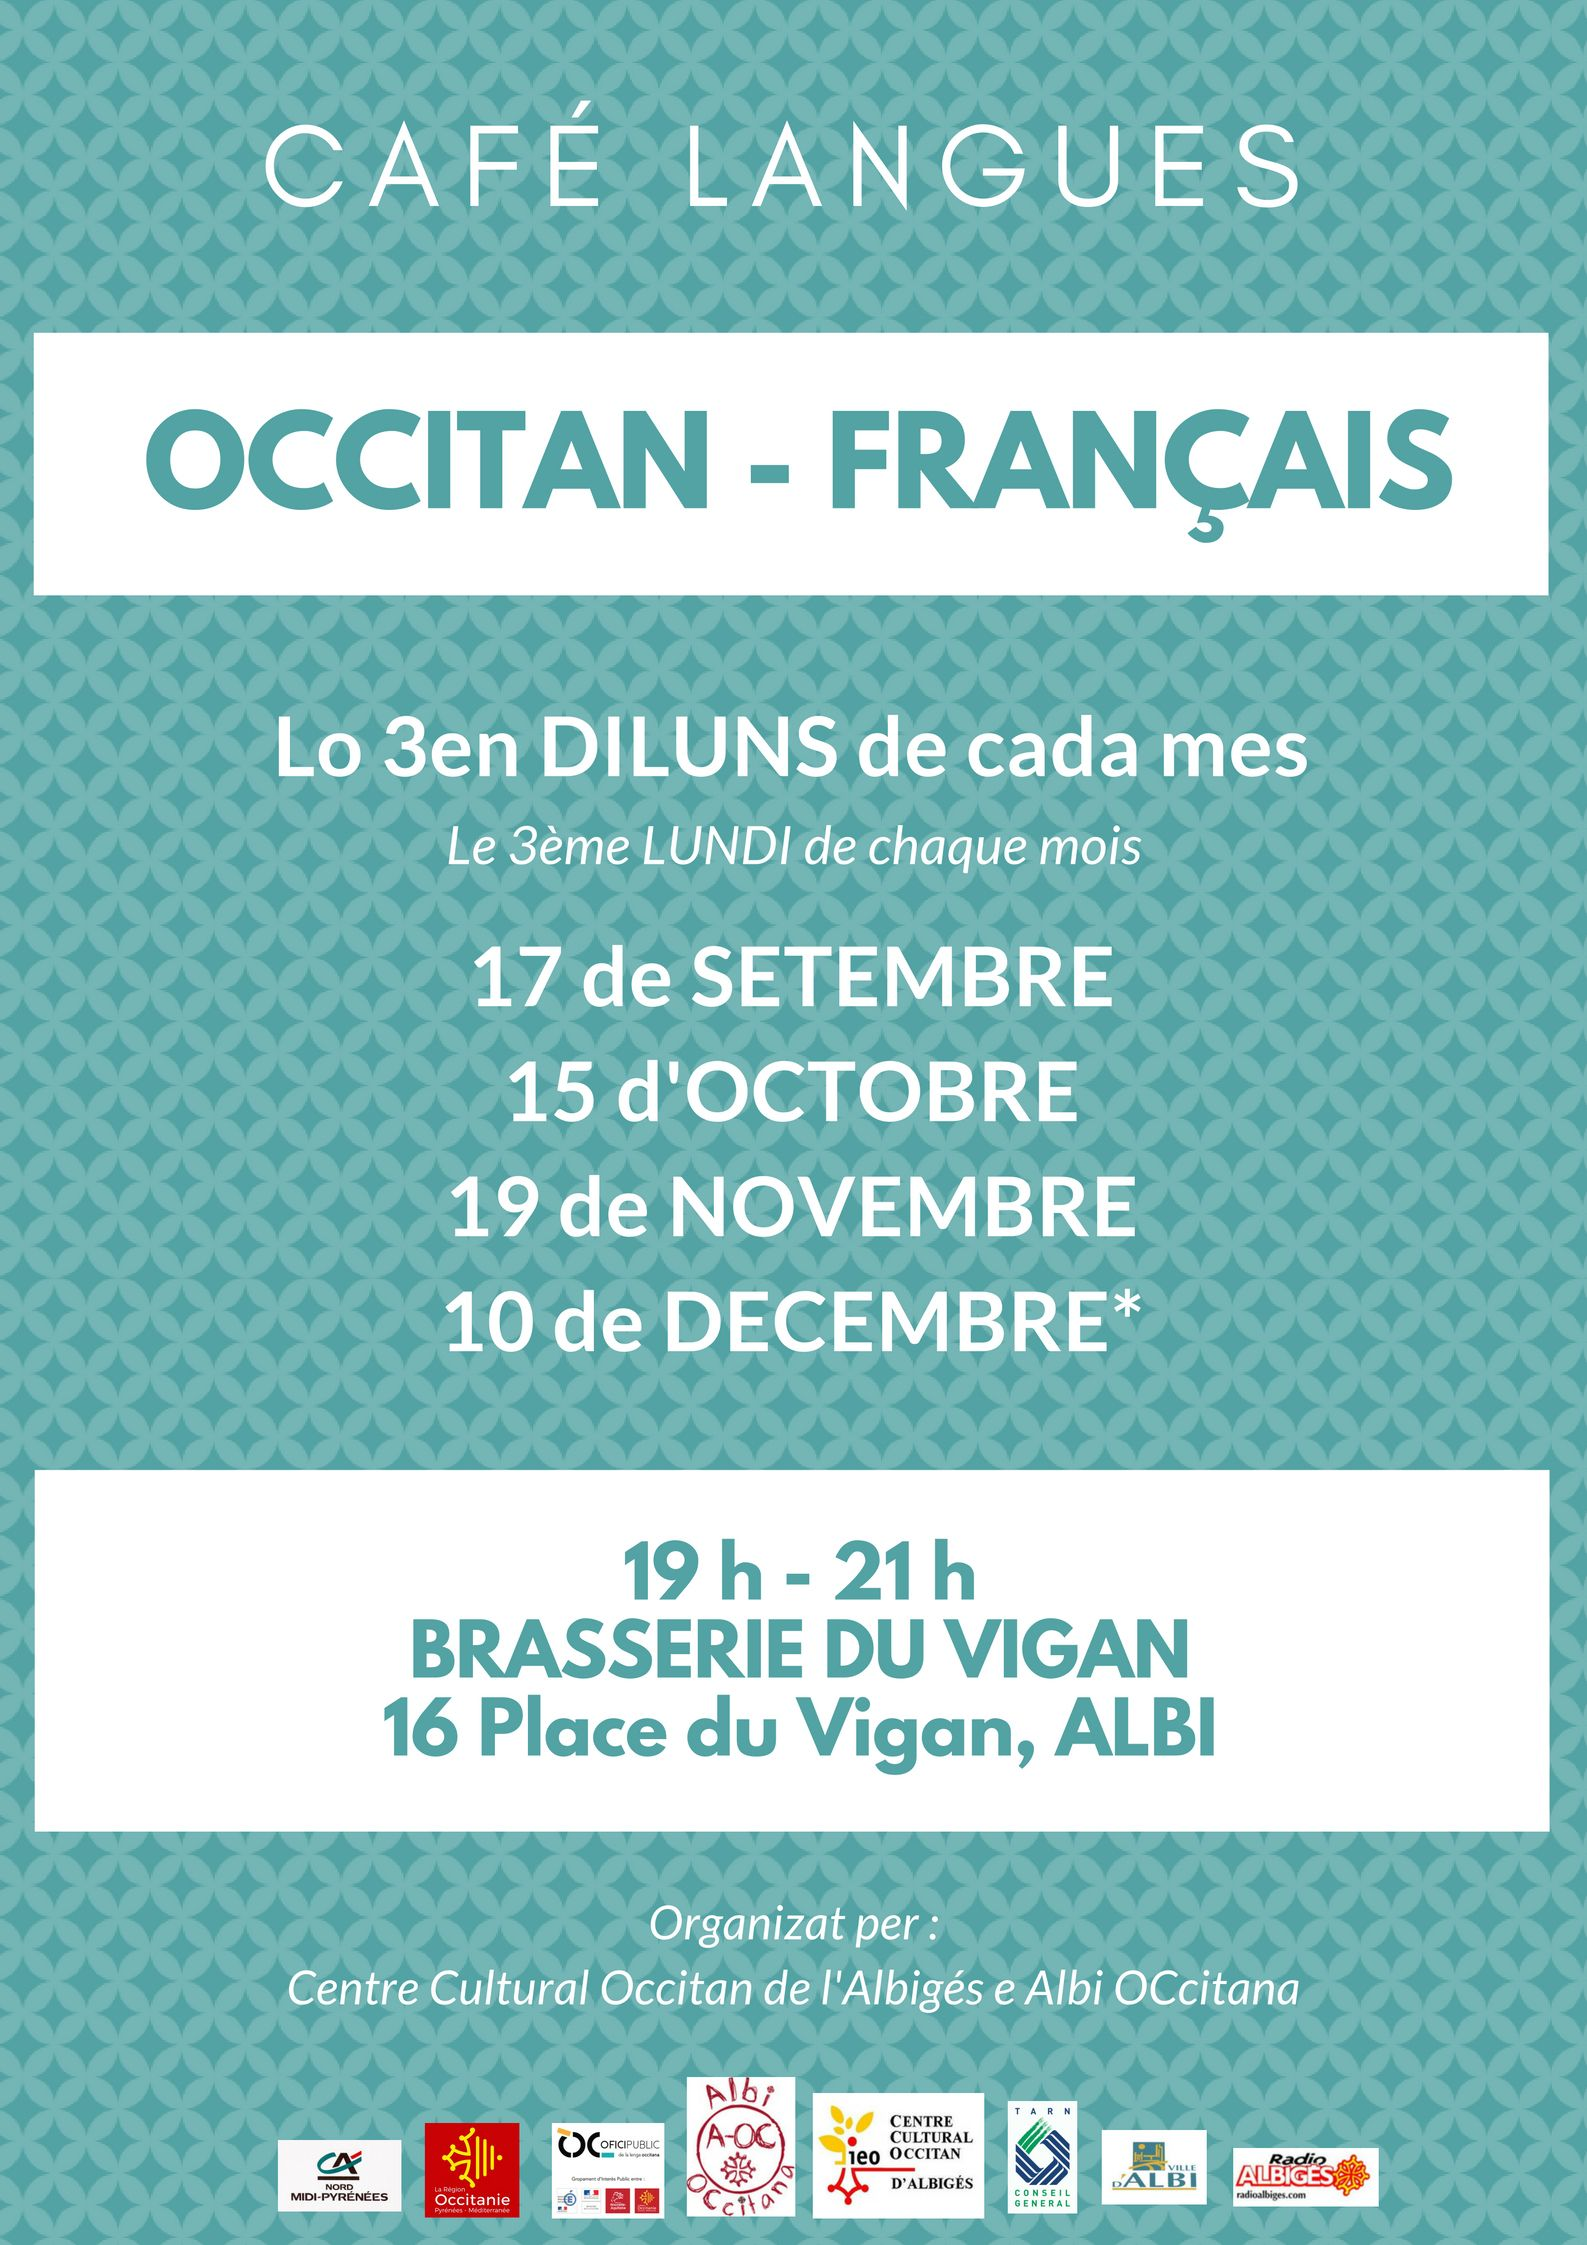 Cafè de las lengas francès/occitan 10 de decembre